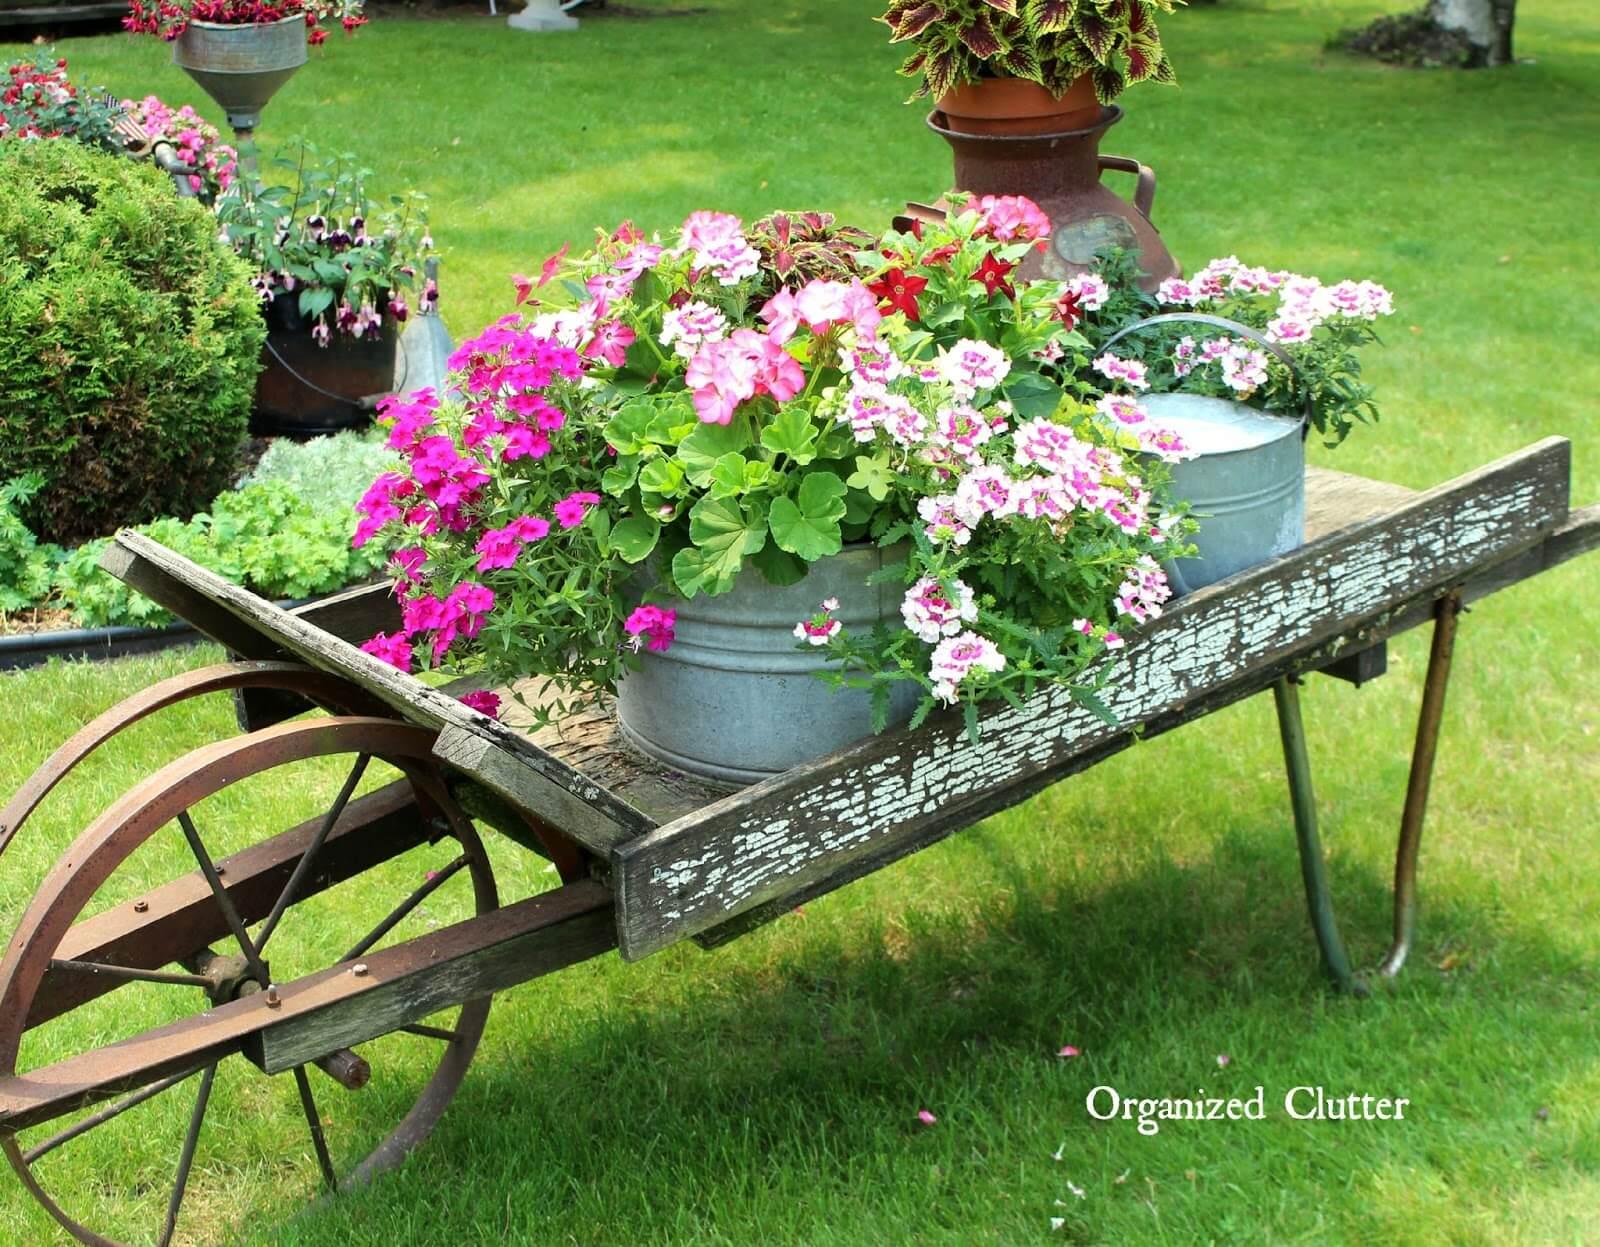 34 Best Vintage Garden Decor Ideas and Designs for 2017 on Garden Decor Ideas  id=71149